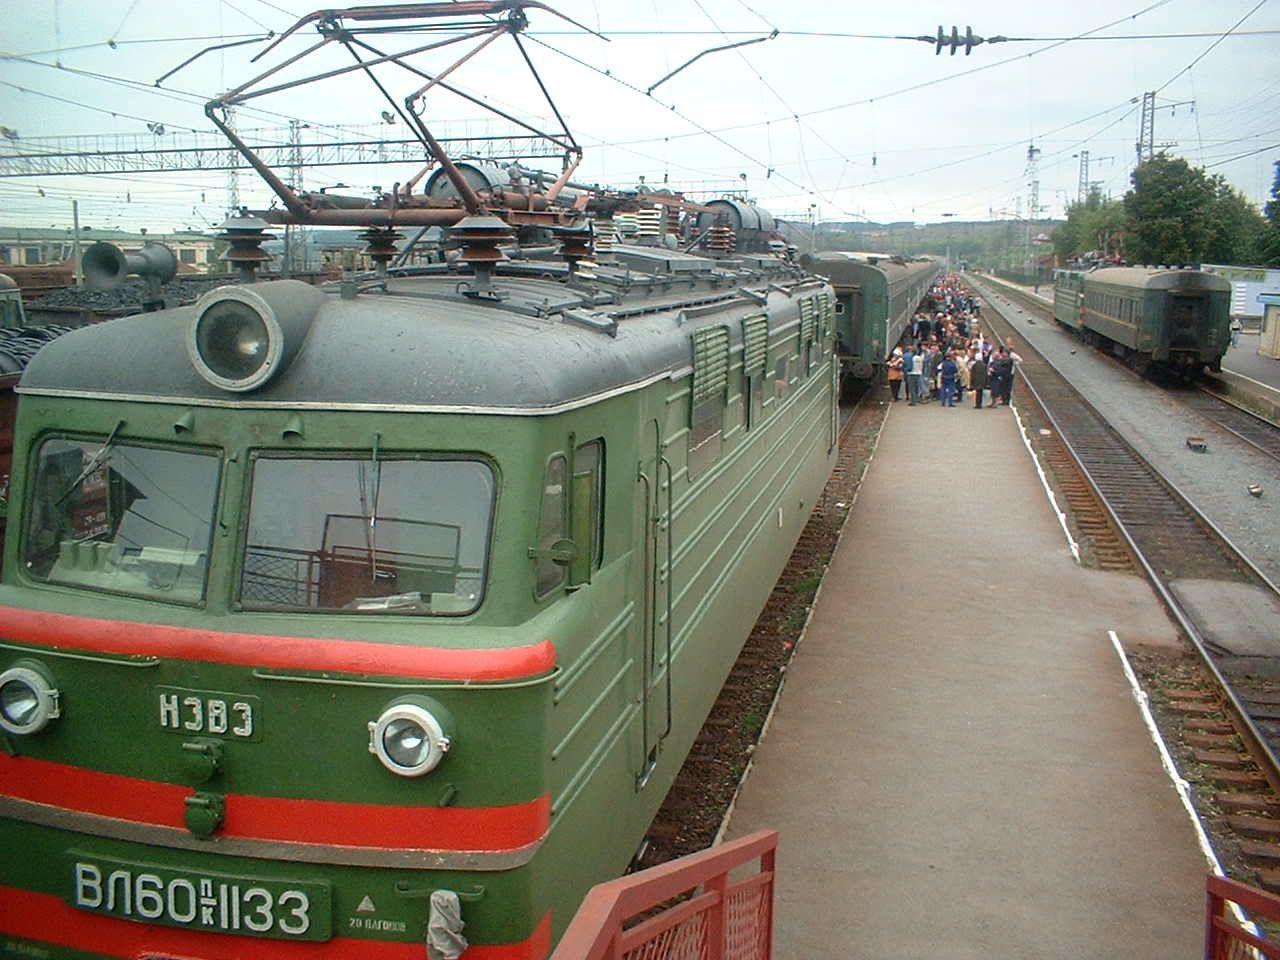 Krasnoufimsk - Changement de locomotive - km 1456